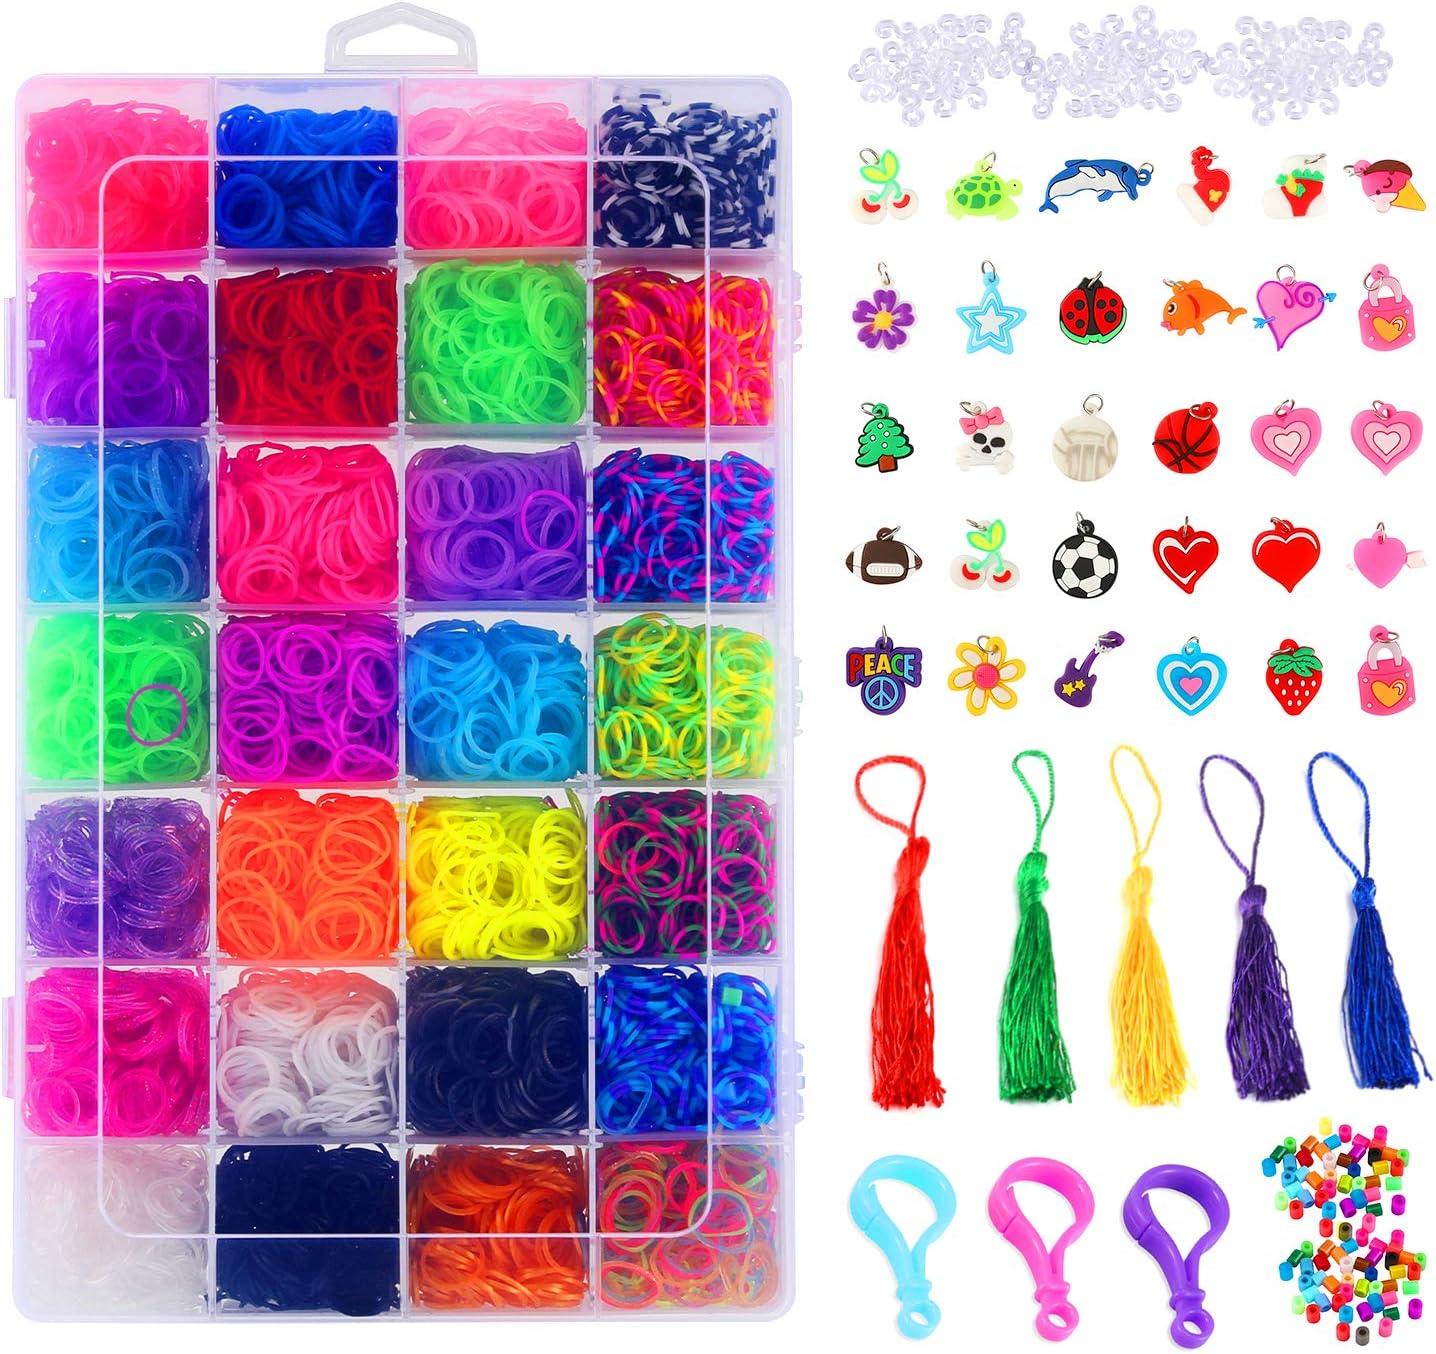 Glonova 11800+ Rubber Ranking TOP17 Bands Bracelet Kids At the price Kit Loom for